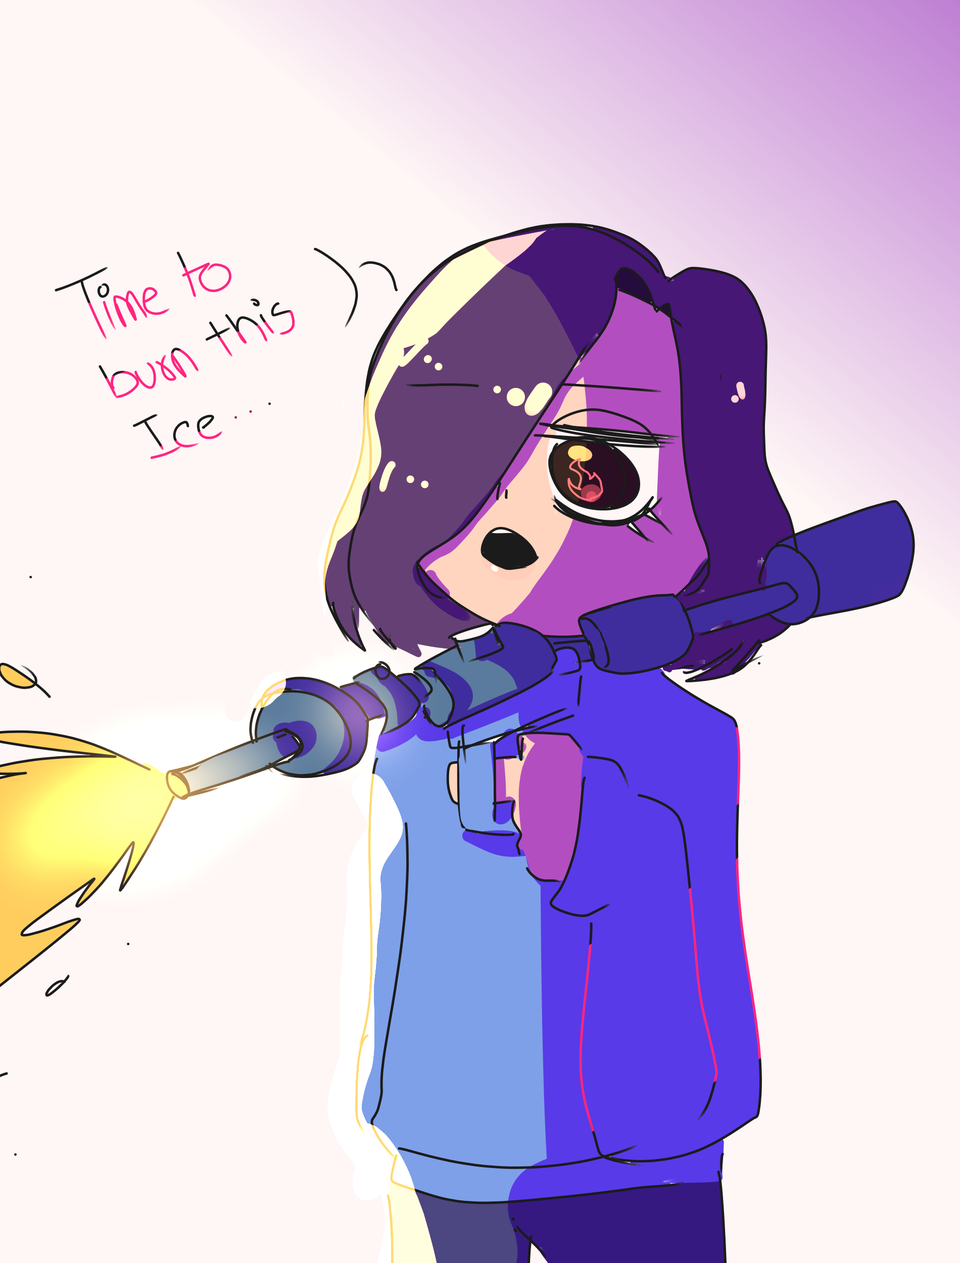 FrEEzE pEEps (read desc if ya want) Illust of Infinite stylez infinitestylez Frozen Medidoneoof Burn